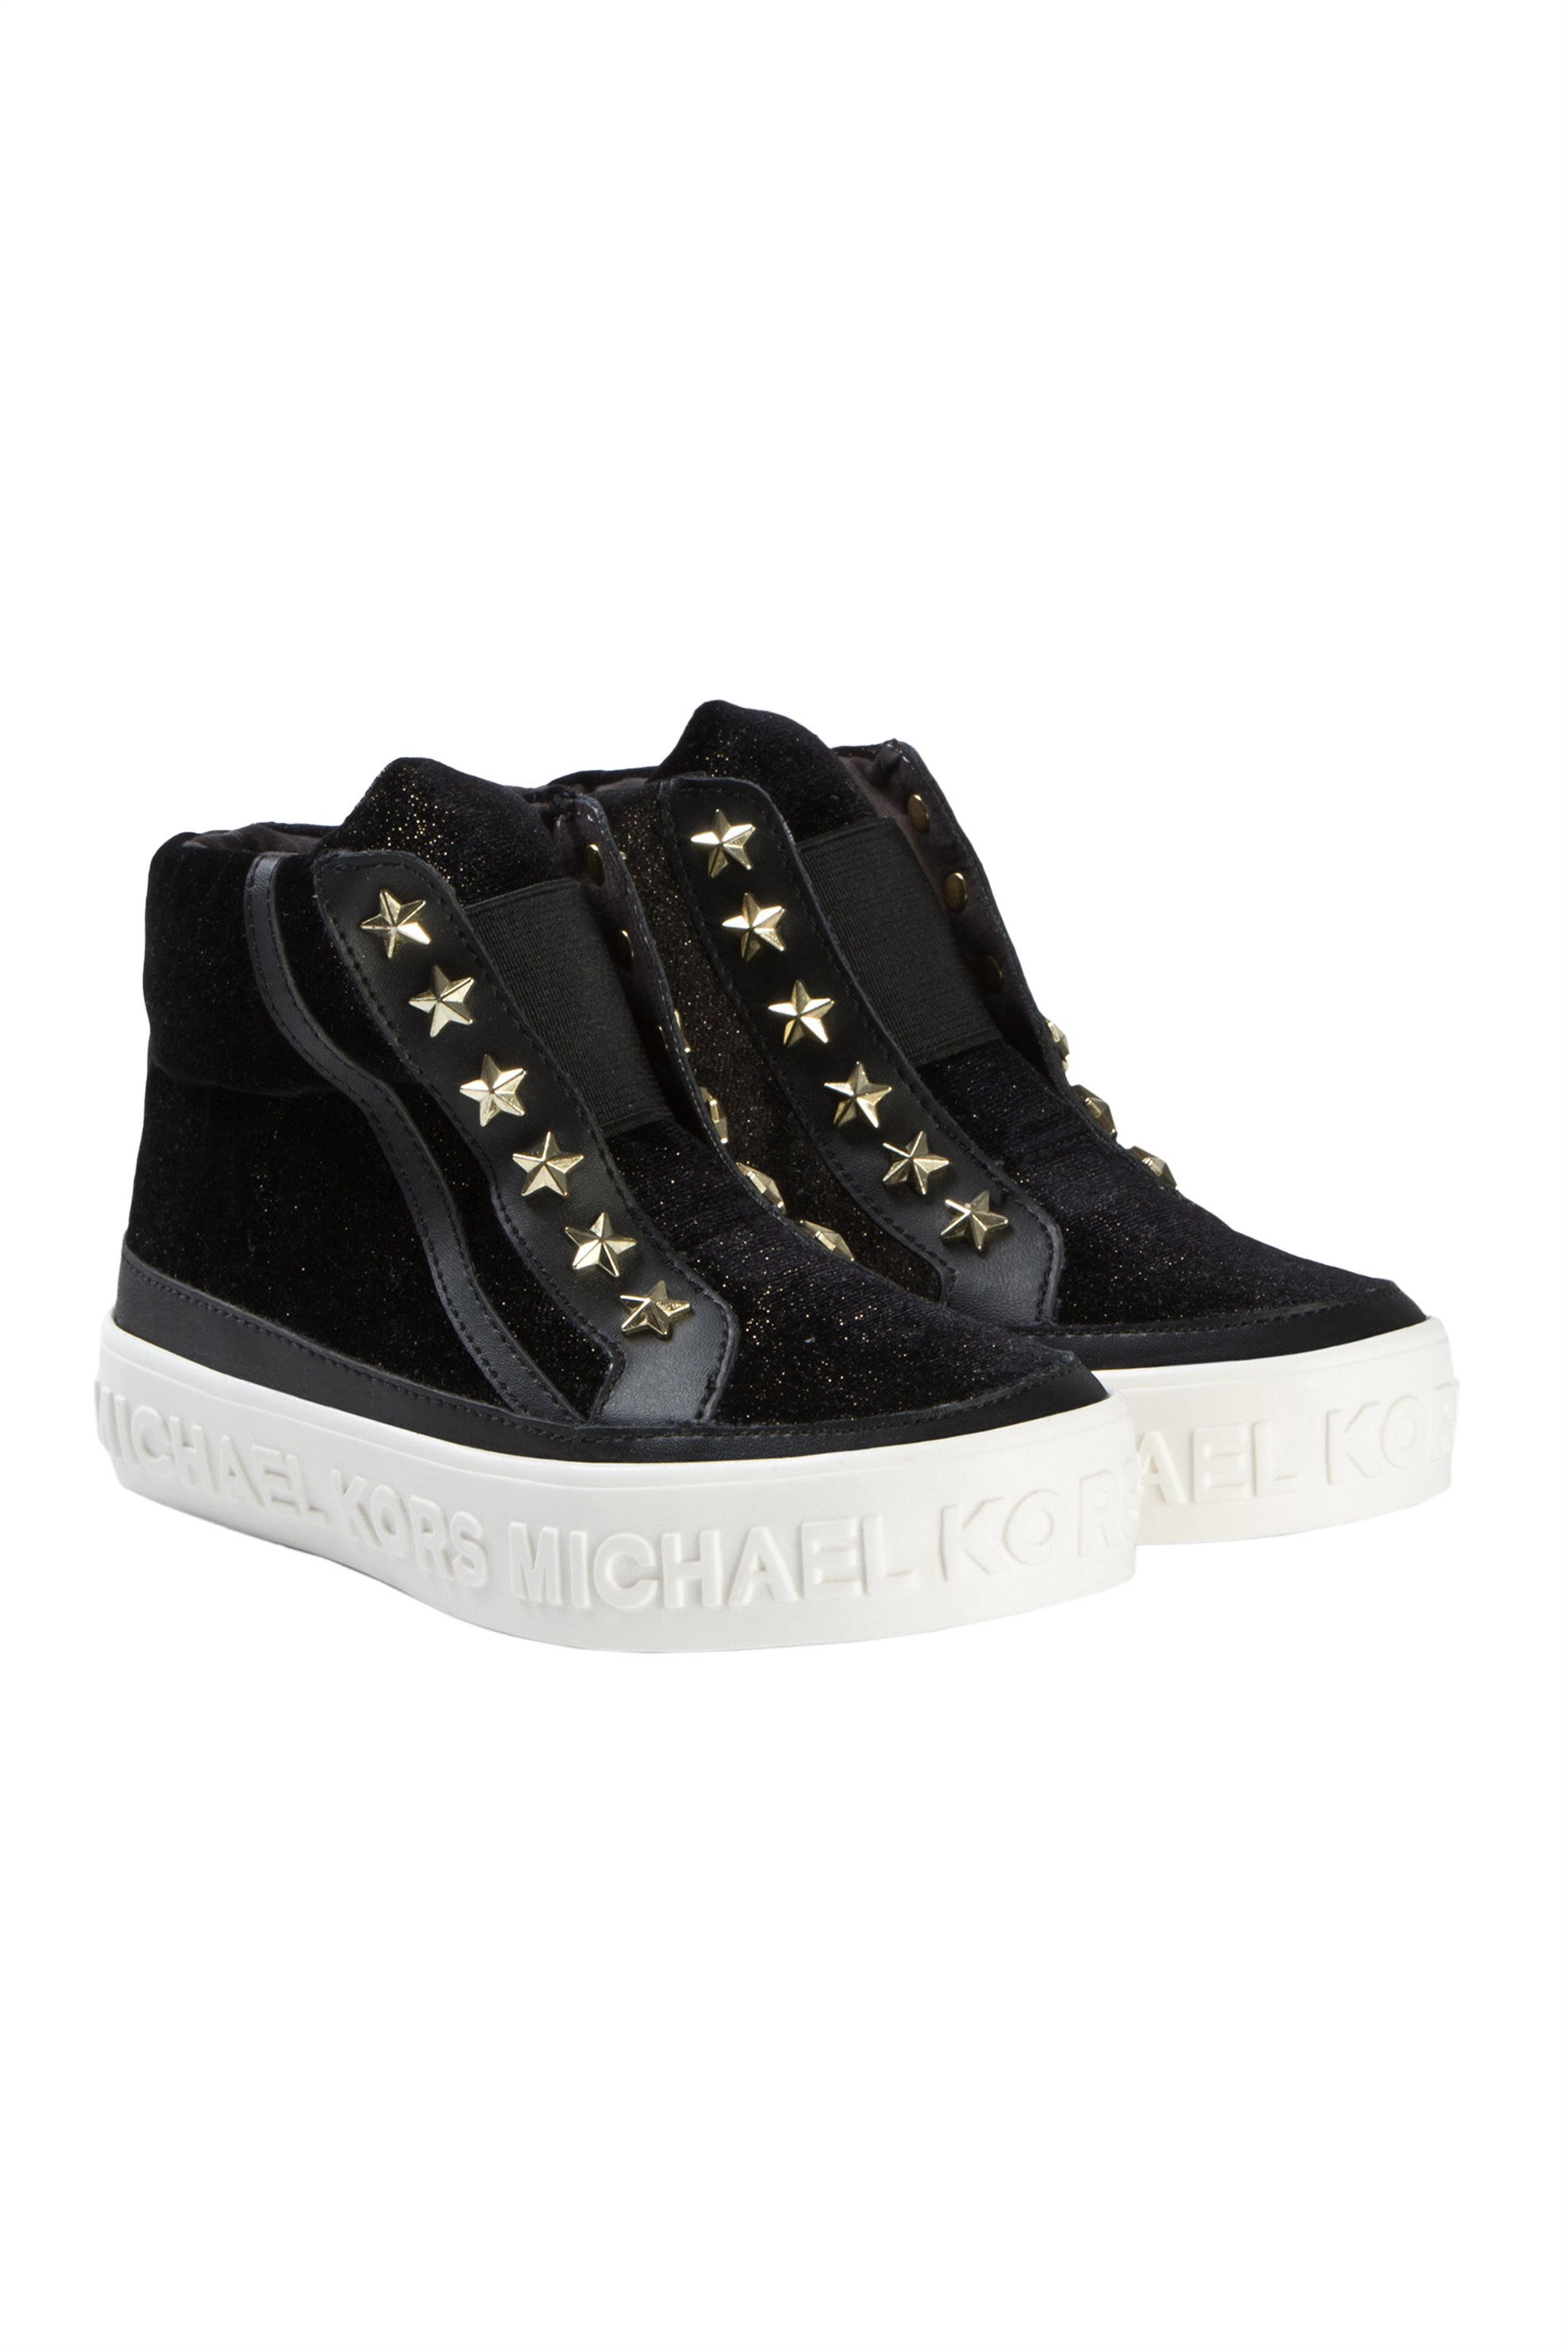 Michael Kors παιδικά μποτάκια Zia Lemon Rock - ZIA LEMON ROCK - Μαύρο παιδι   παπουτσια   κορίτσια   μπότες